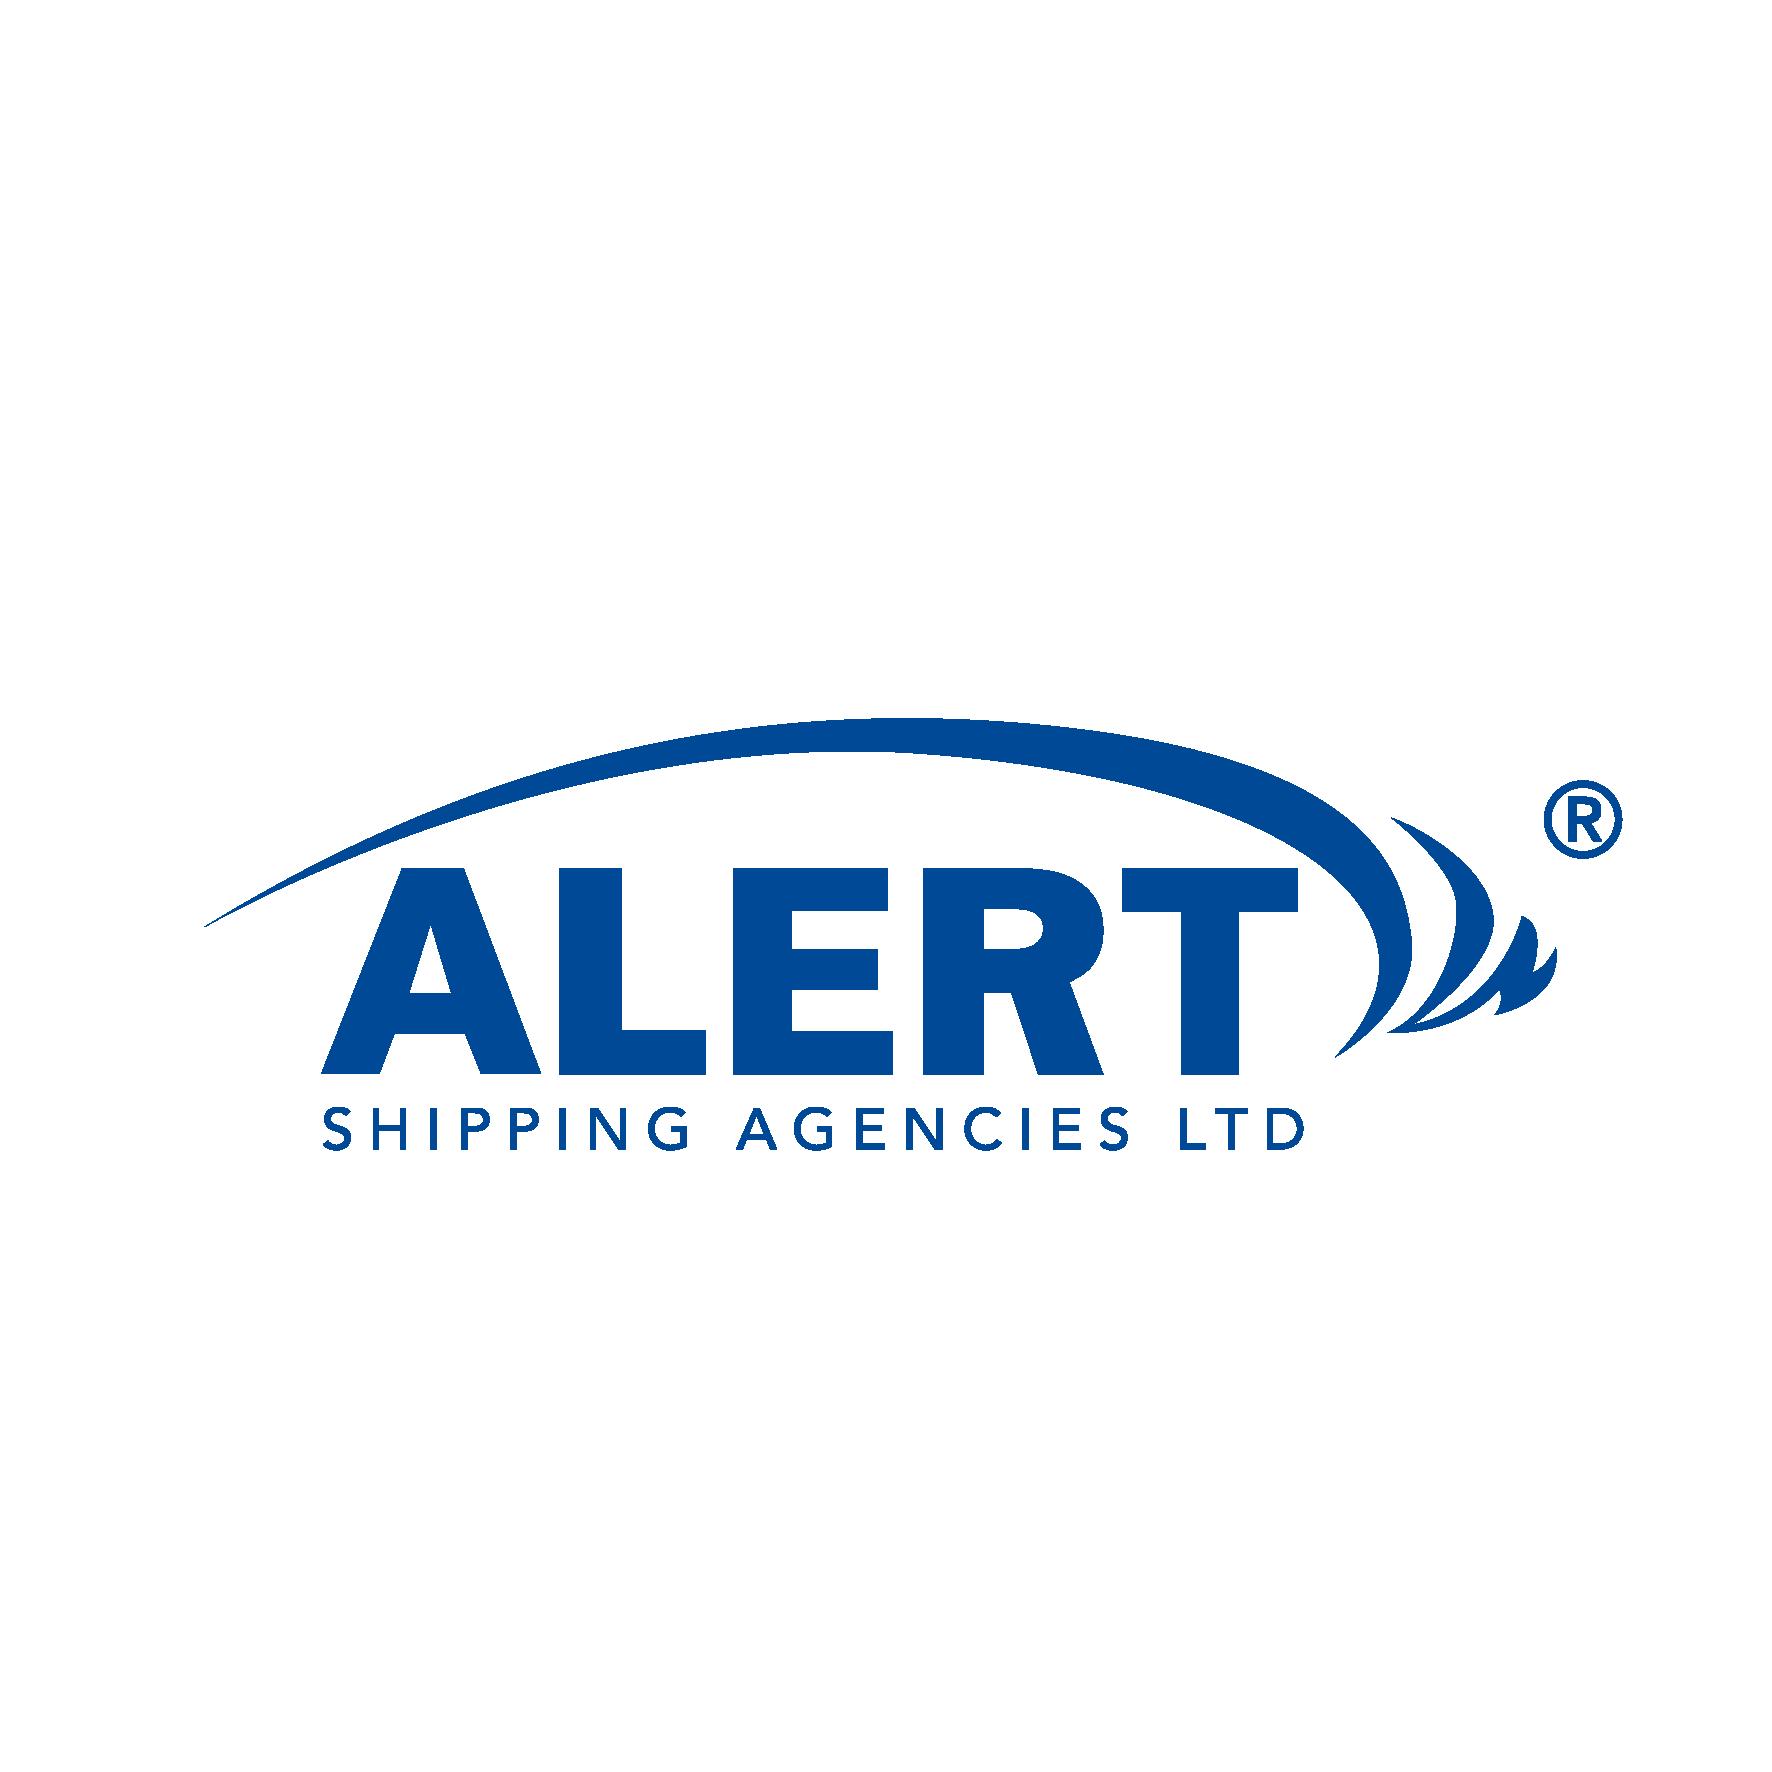 ALERT SHIPPING AGENCIES LTD